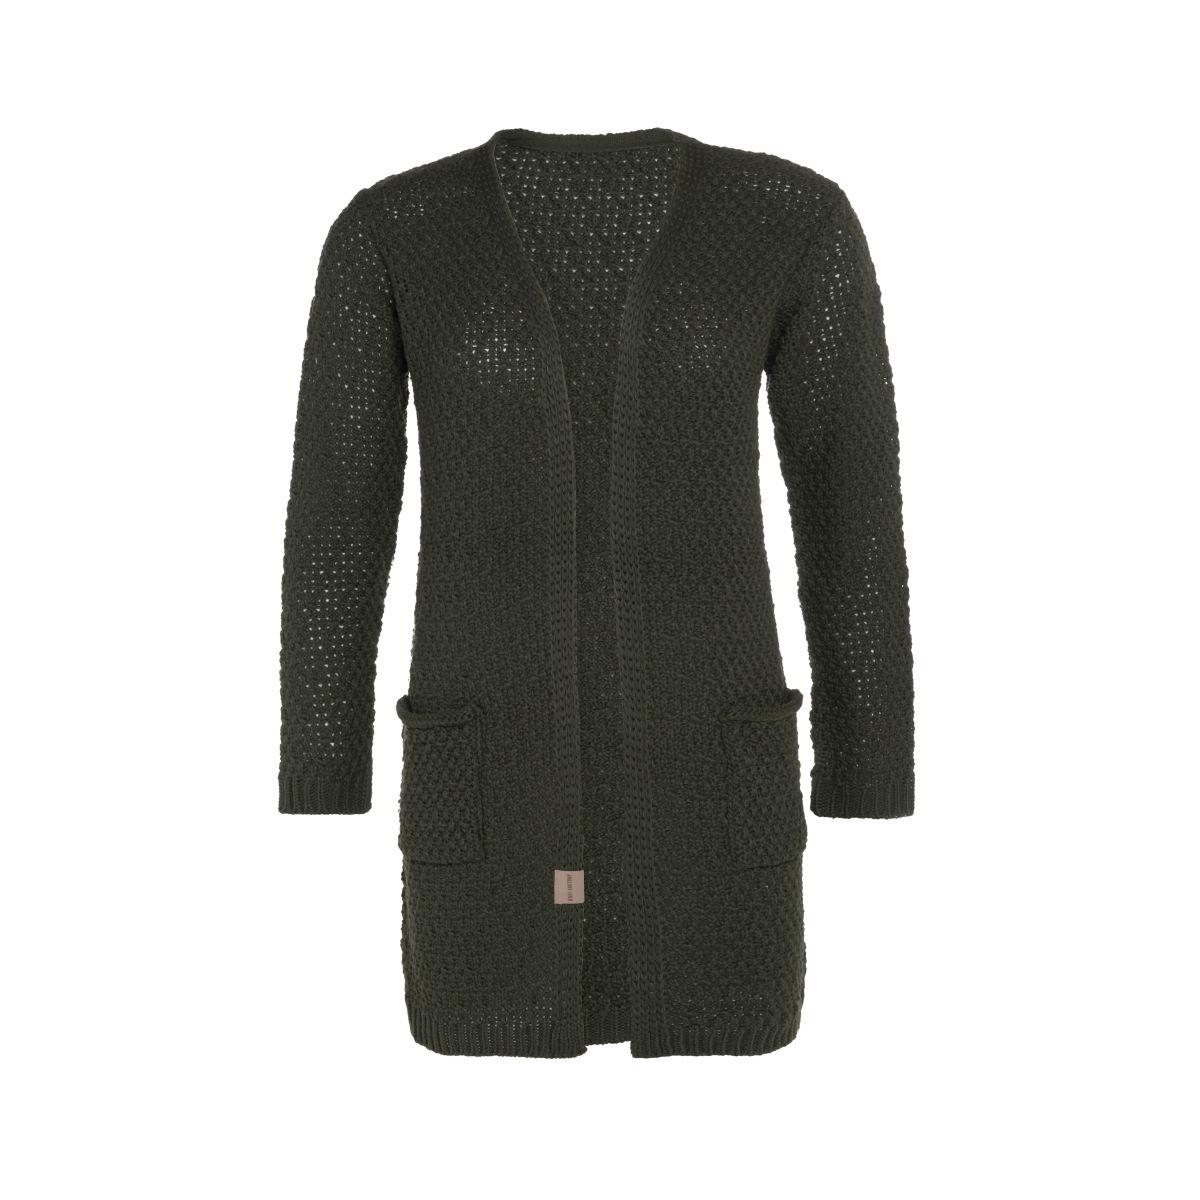 knit factory kf13308102551 luna vest khaki 4042 1